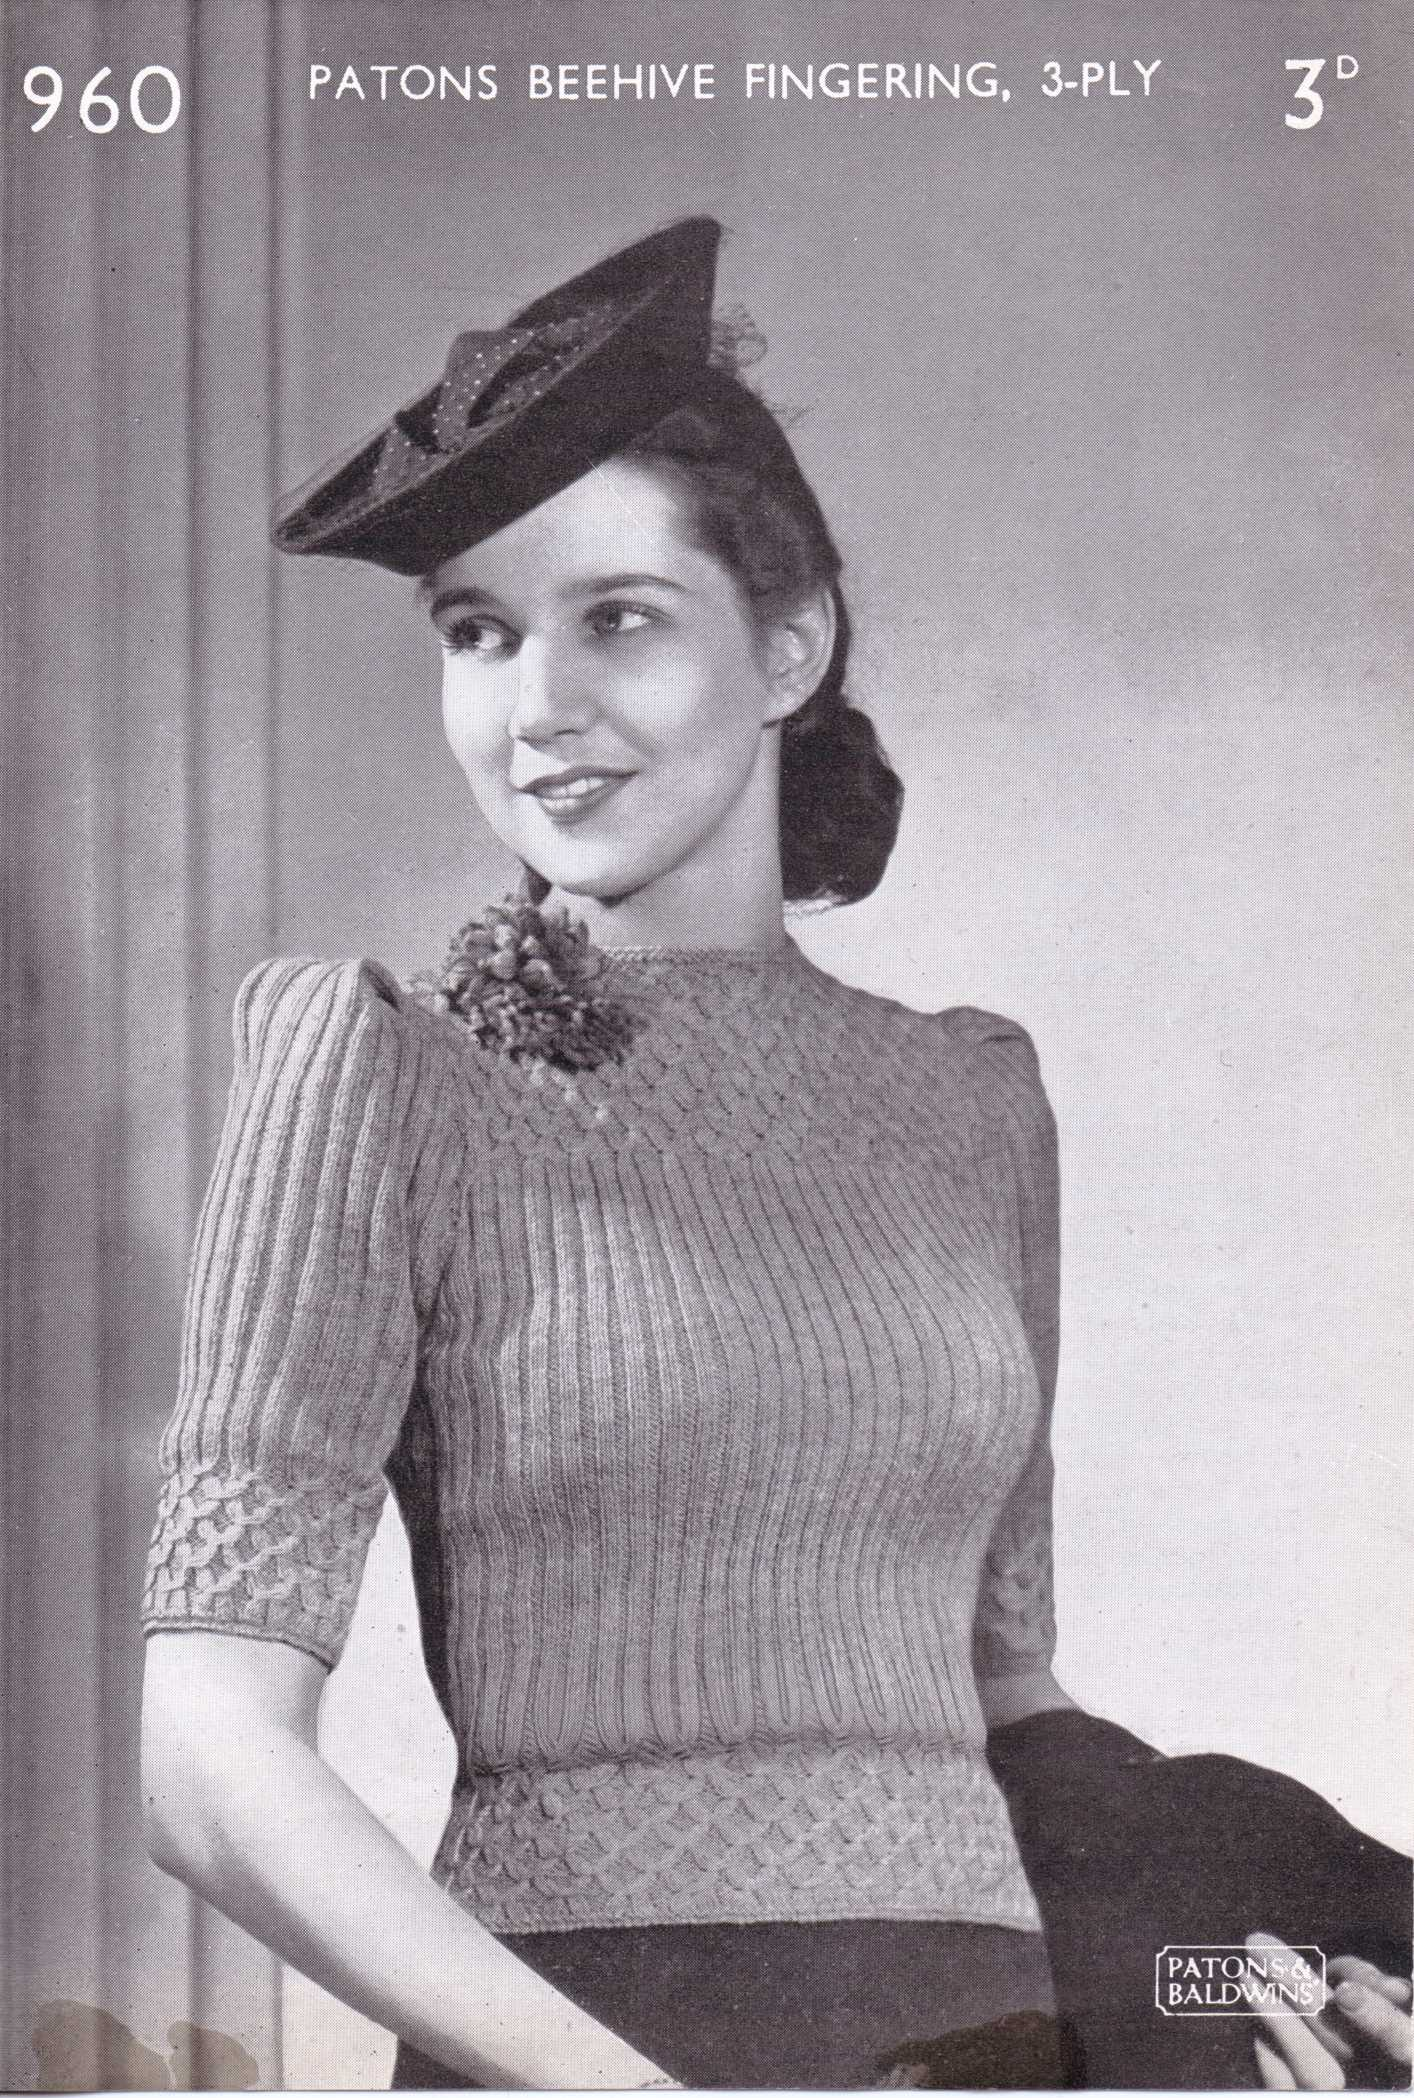 Free Vintage Knitting Pattern – Patons No. 960 – The Sunny Stitcher